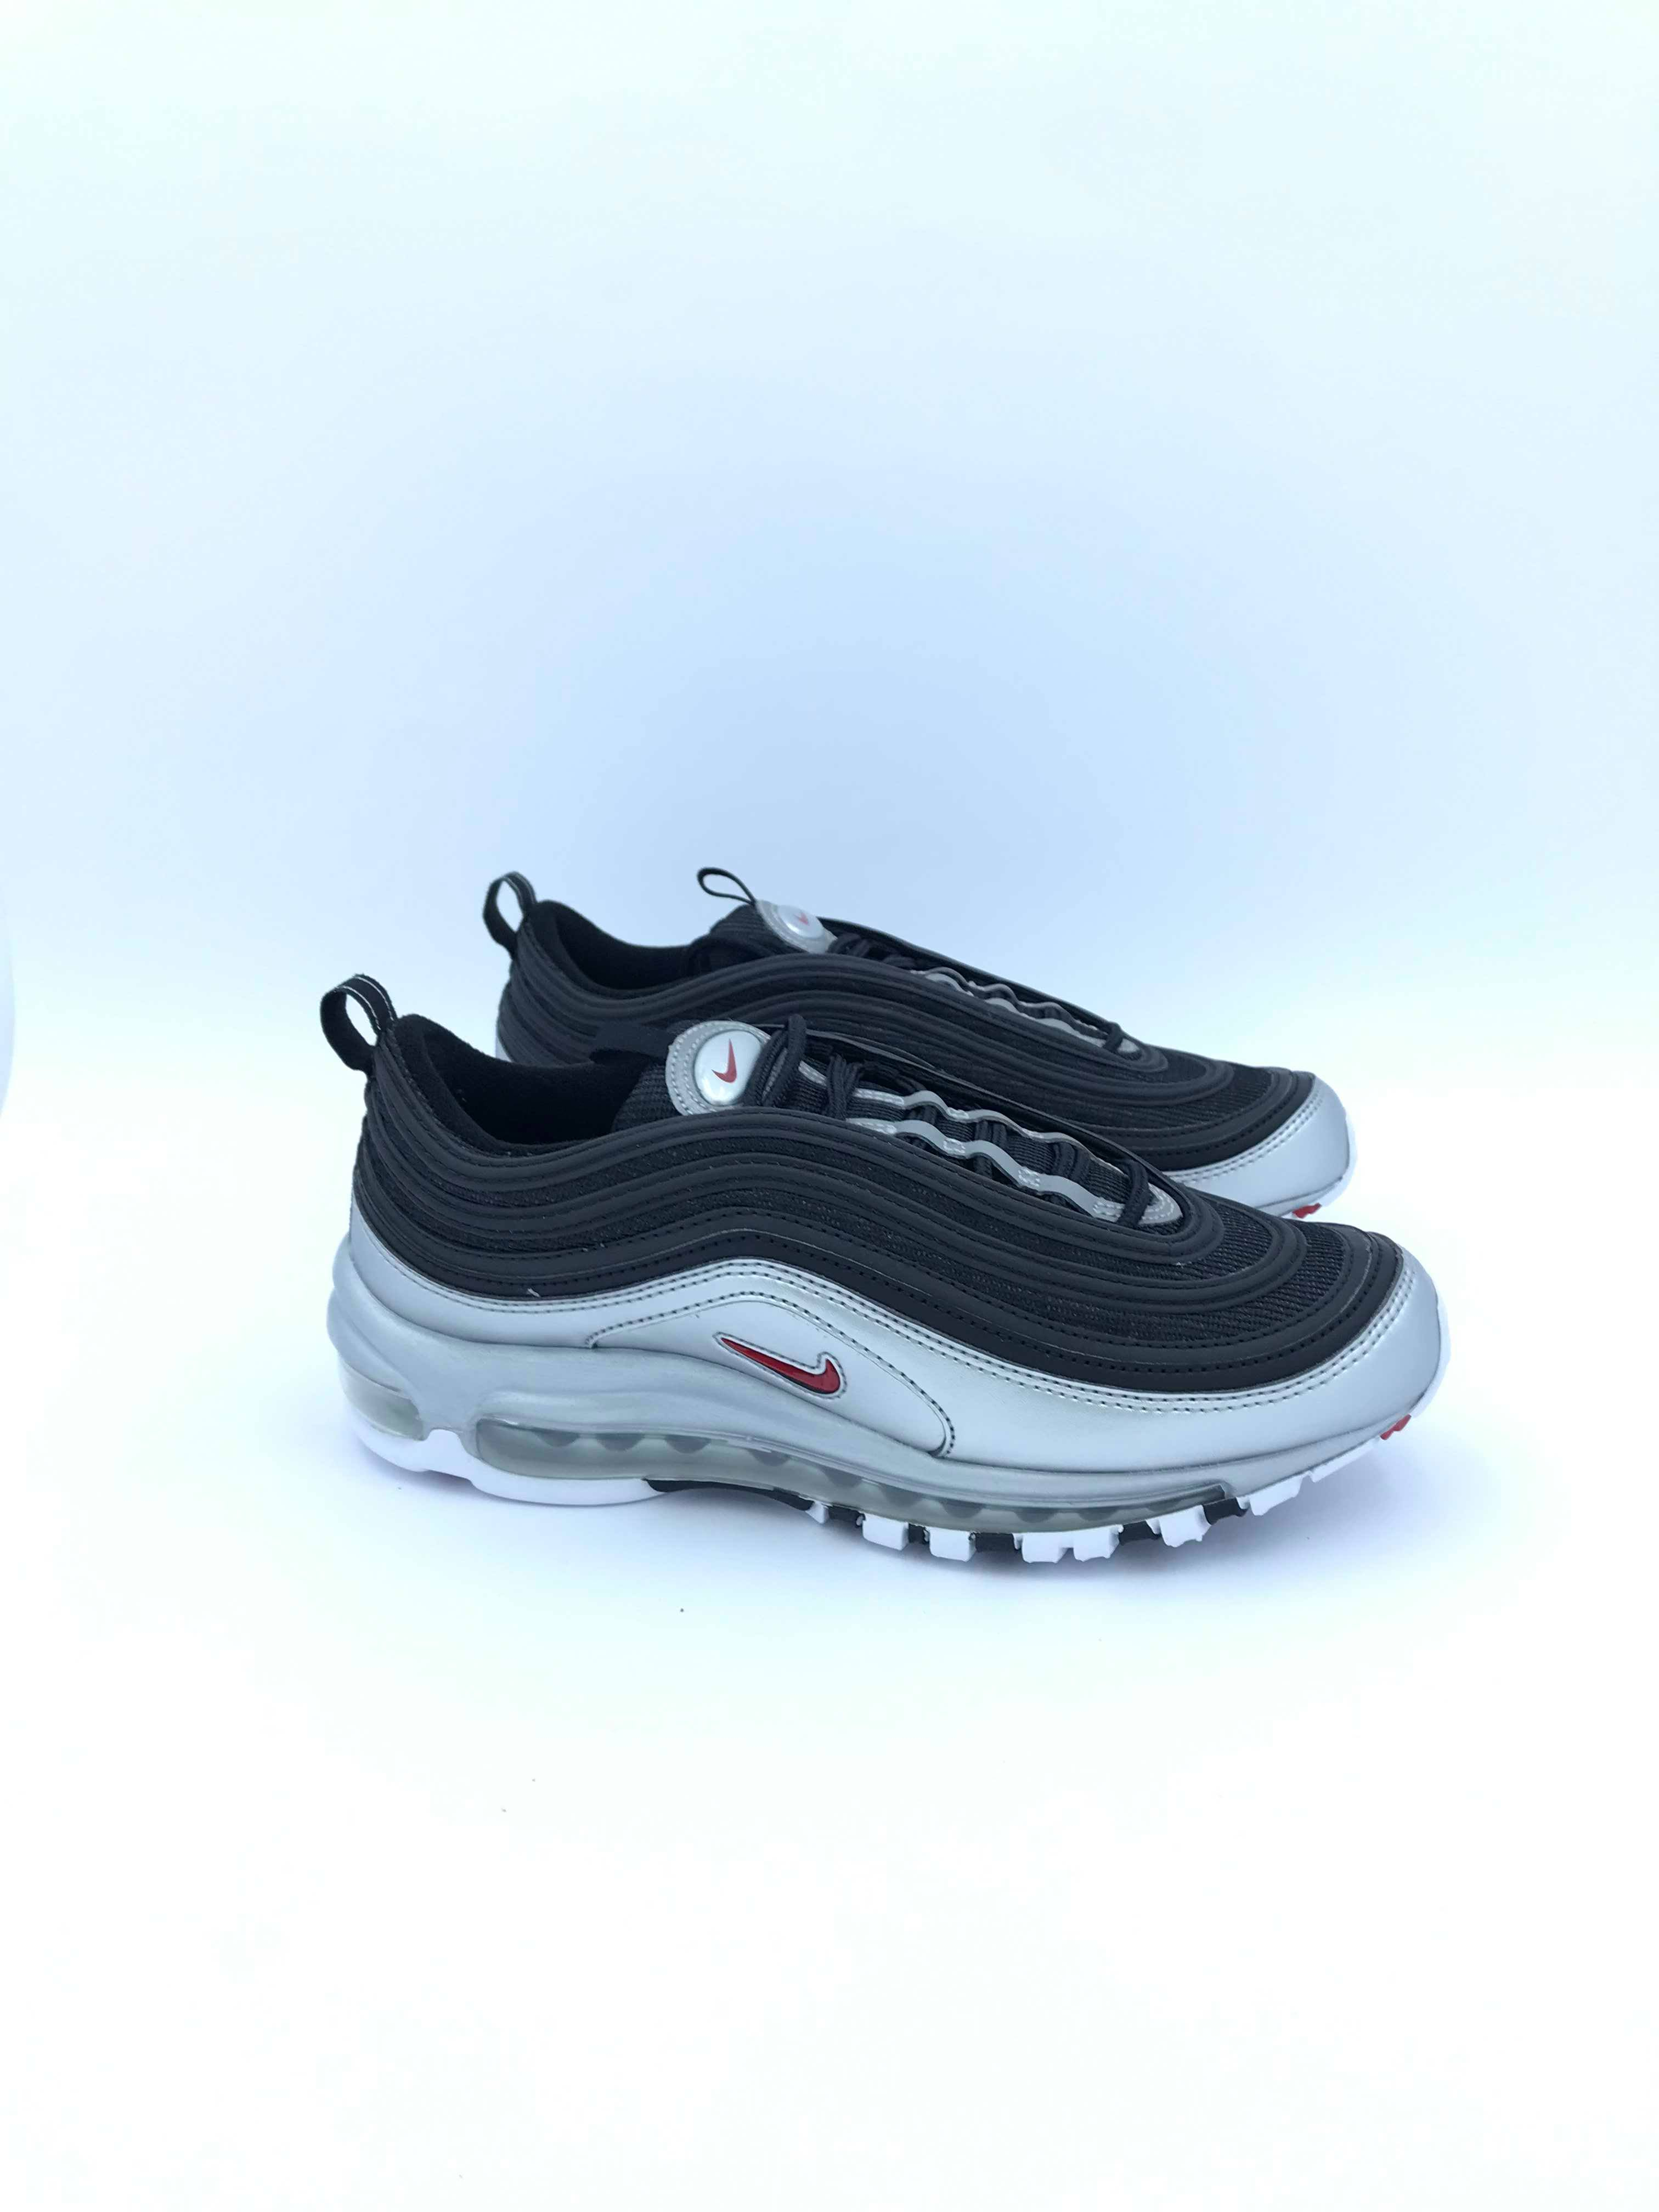 Max Air Nike Qs At5458 97 Blacksilver 001 uF1Tlc5KJ3